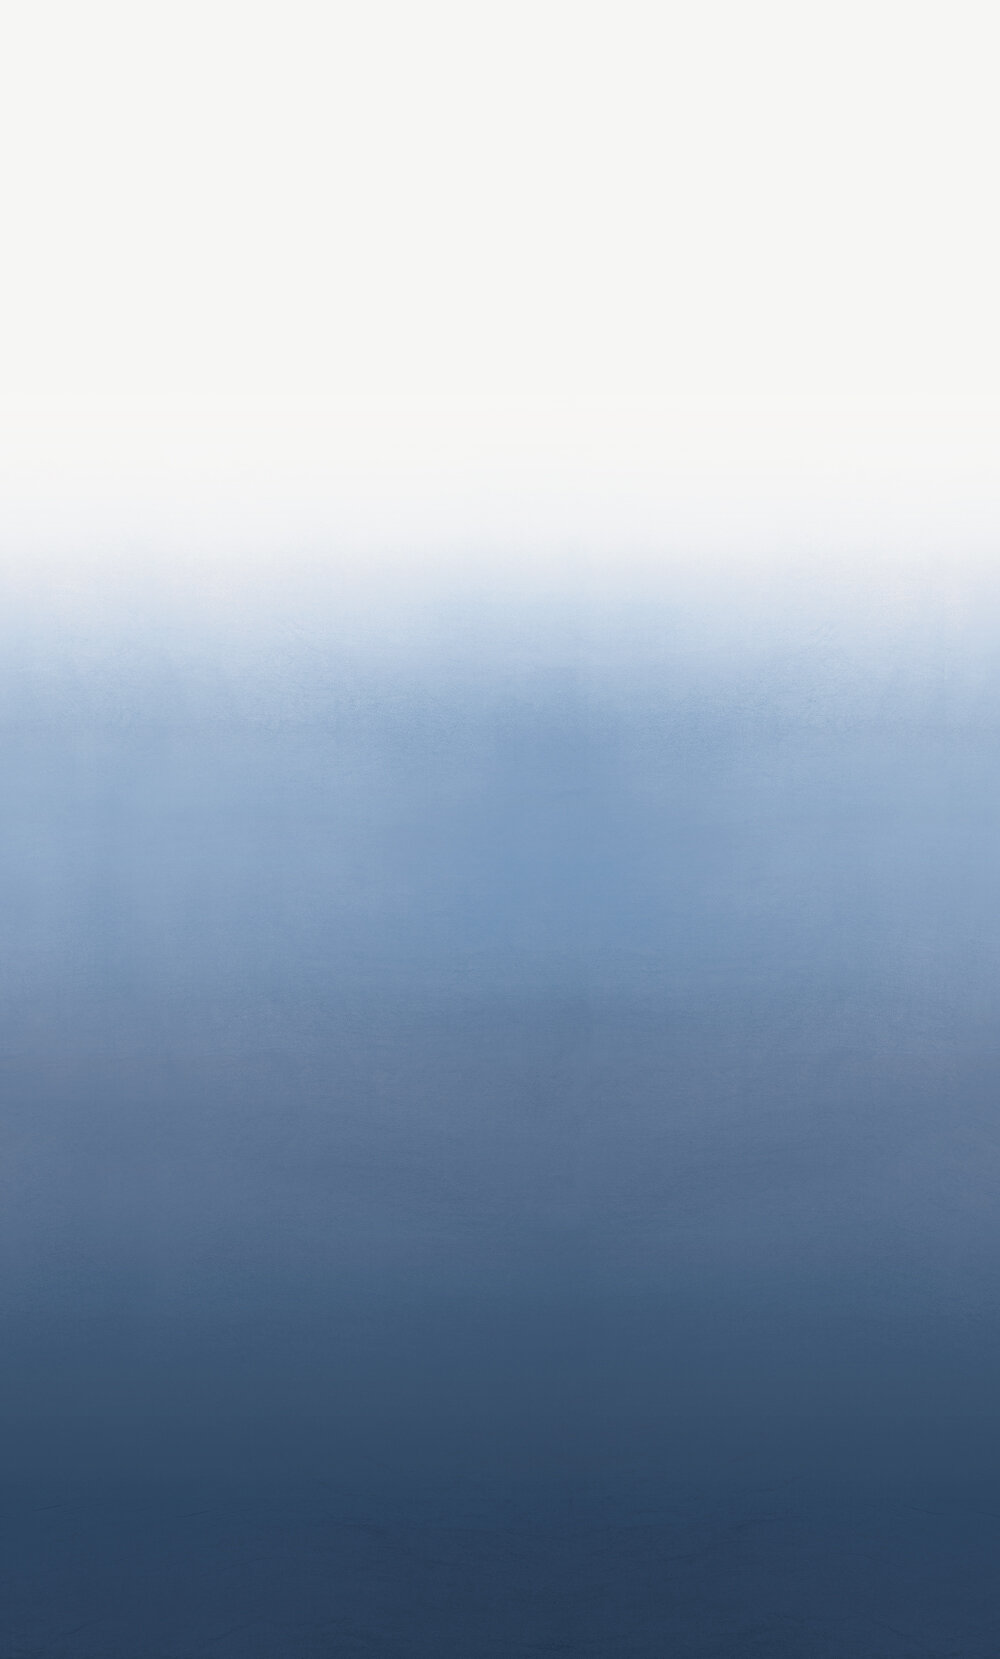 Saraille Mural - Indigo - by Designers Guild